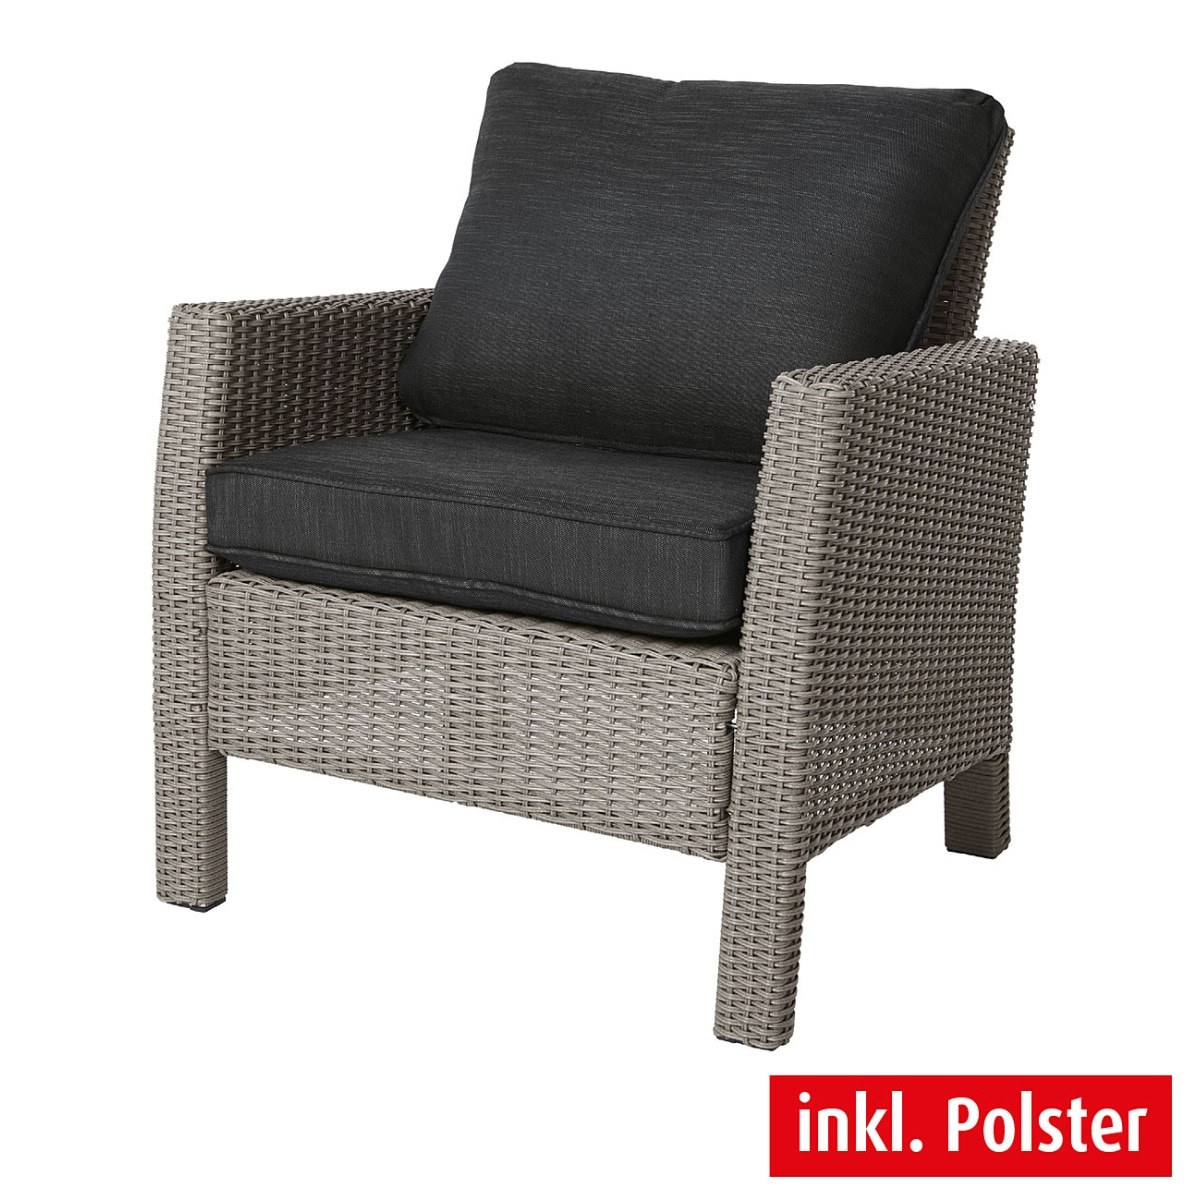 outdoor sessel mit kissen smoky kunststoffgeflecht grau porta. Black Bedroom Furniture Sets. Home Design Ideas